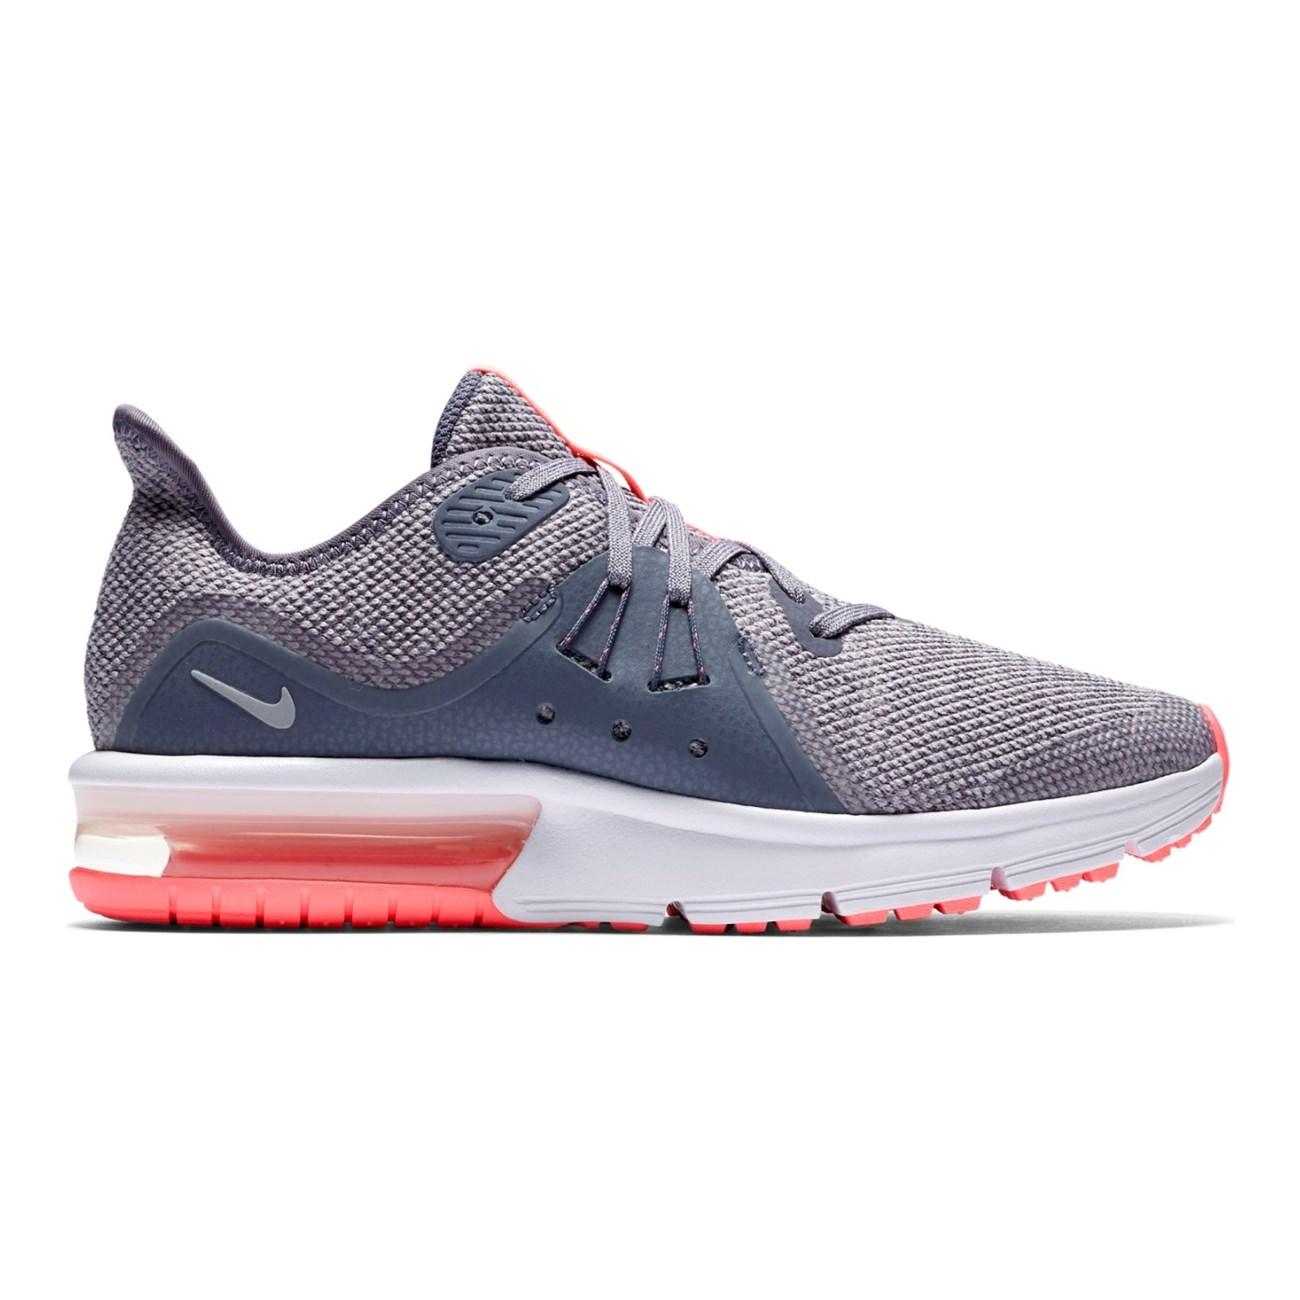 060abf61444 NIKE AIR MAX SEQUENT 3 GS < Παπούτσια για Τρέξιμο   INTERSPORT